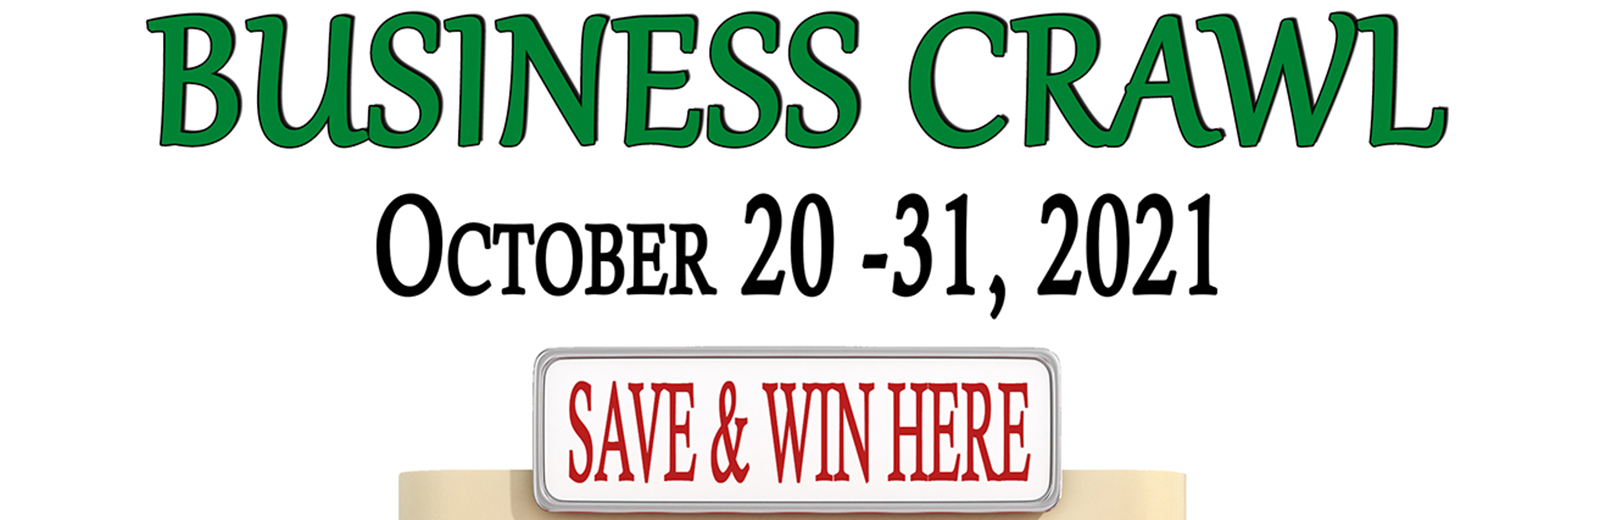 ss-business-crawl-2021